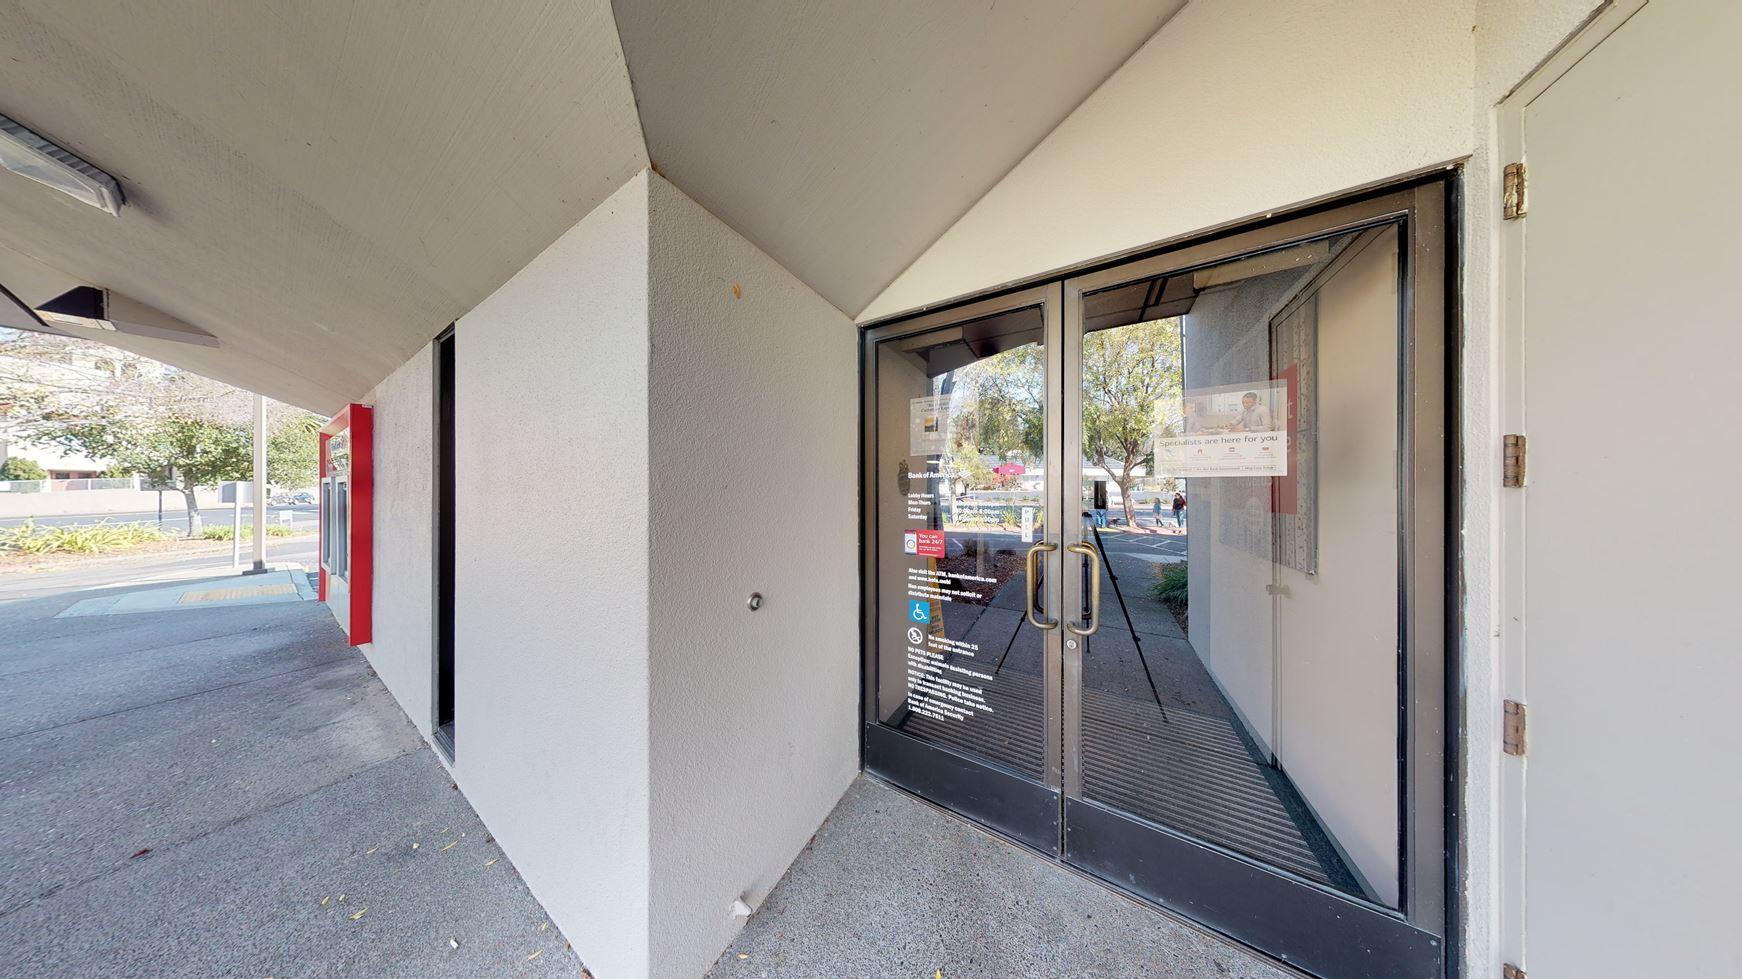 Bank of America financial center with drive-thru ATM | 7185 Healdsburg Ave, Sebastopol, CA 95472